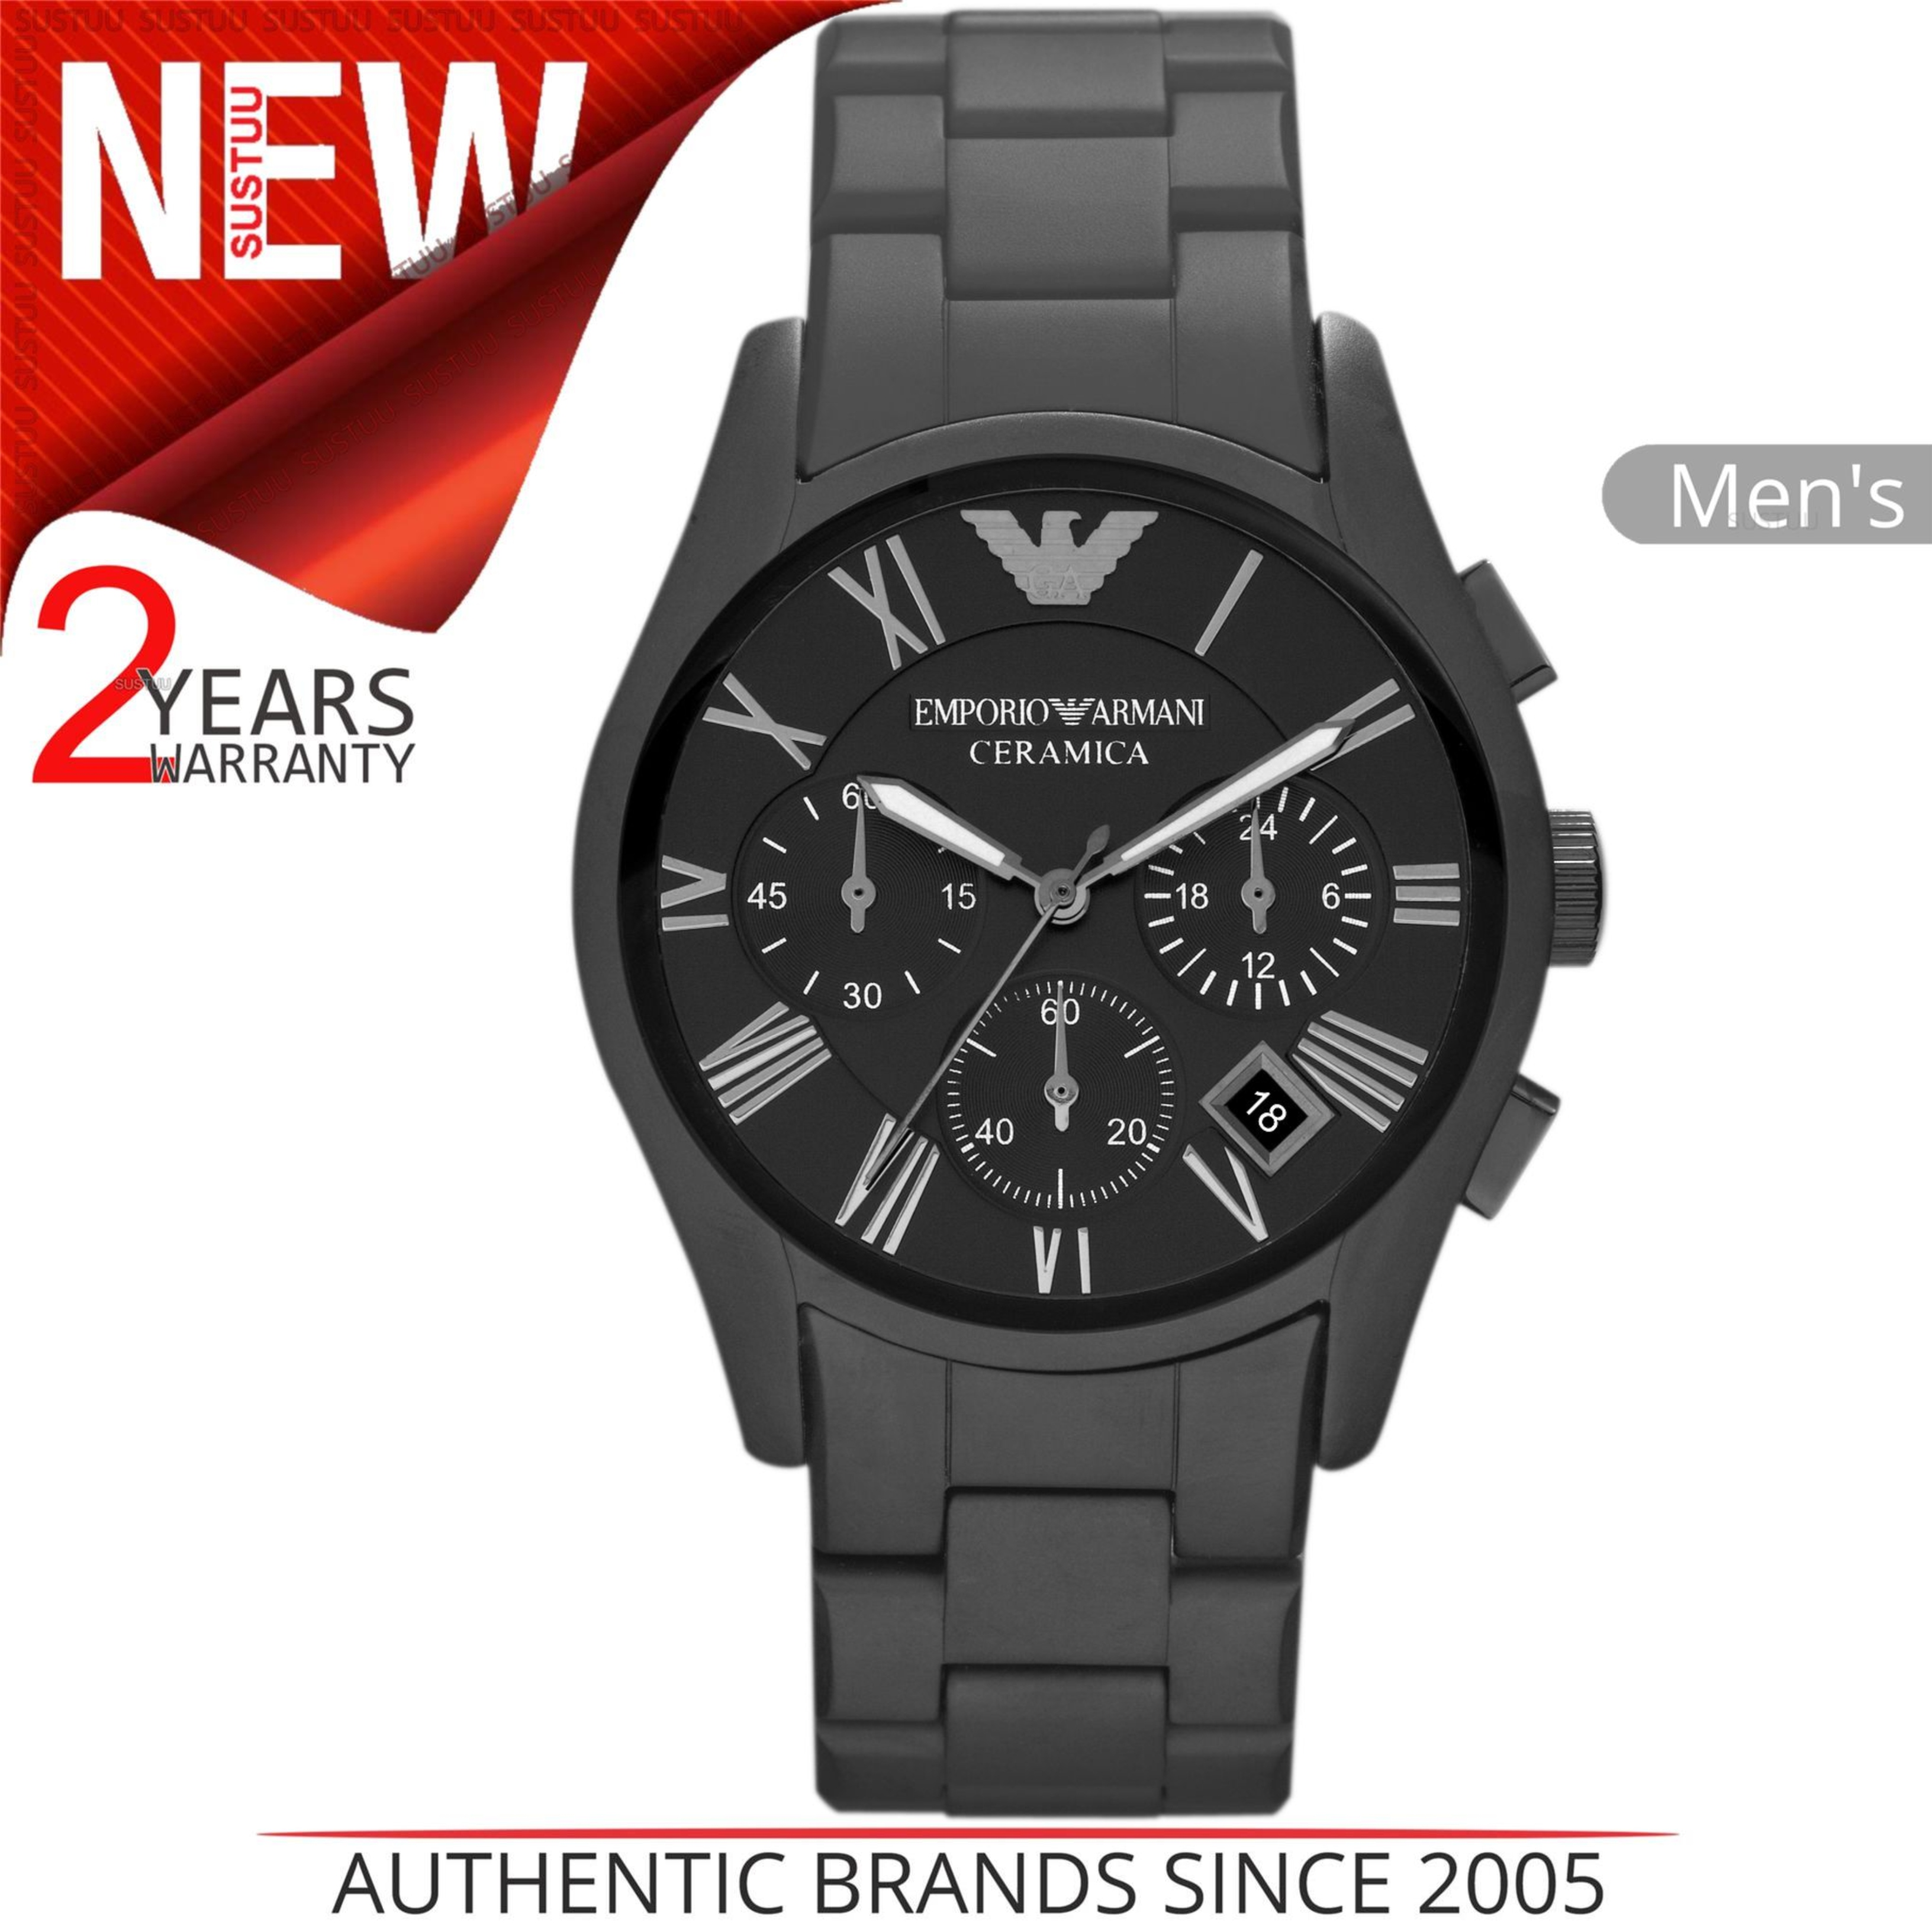 b3cfa355bcc Details about Emporio Armani Ceramica Men s Watch│Chronograph Black Dial│ Ceramic Strap│AR1457